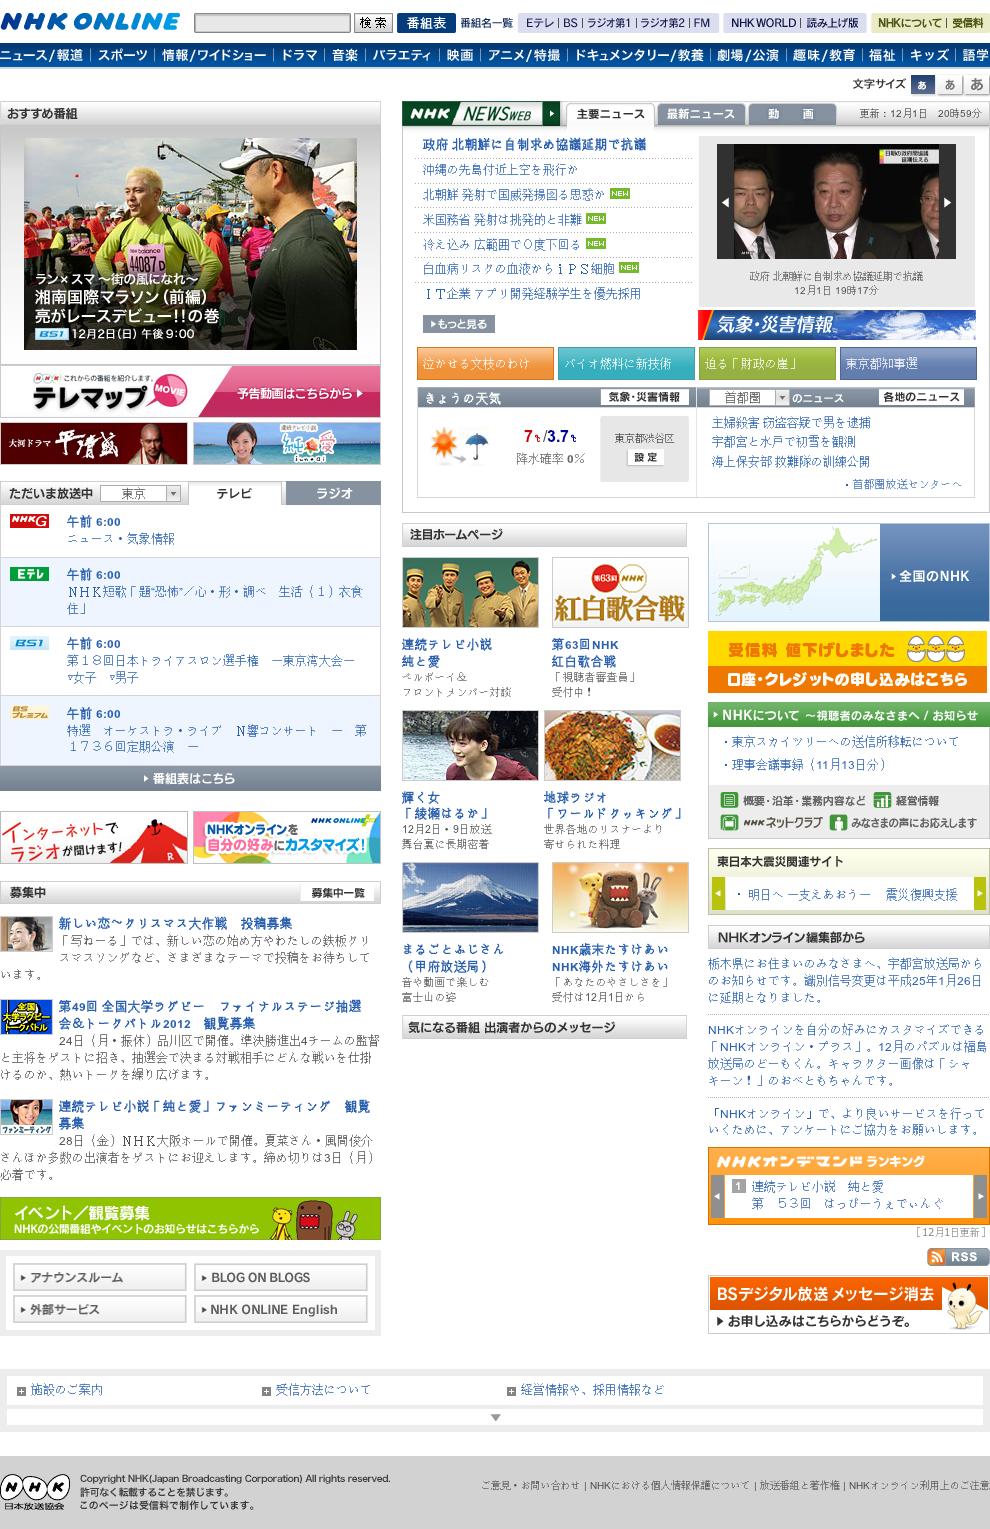 NHK Online at Saturday Dec. 1, 2012, 9:20 p.m. UTC